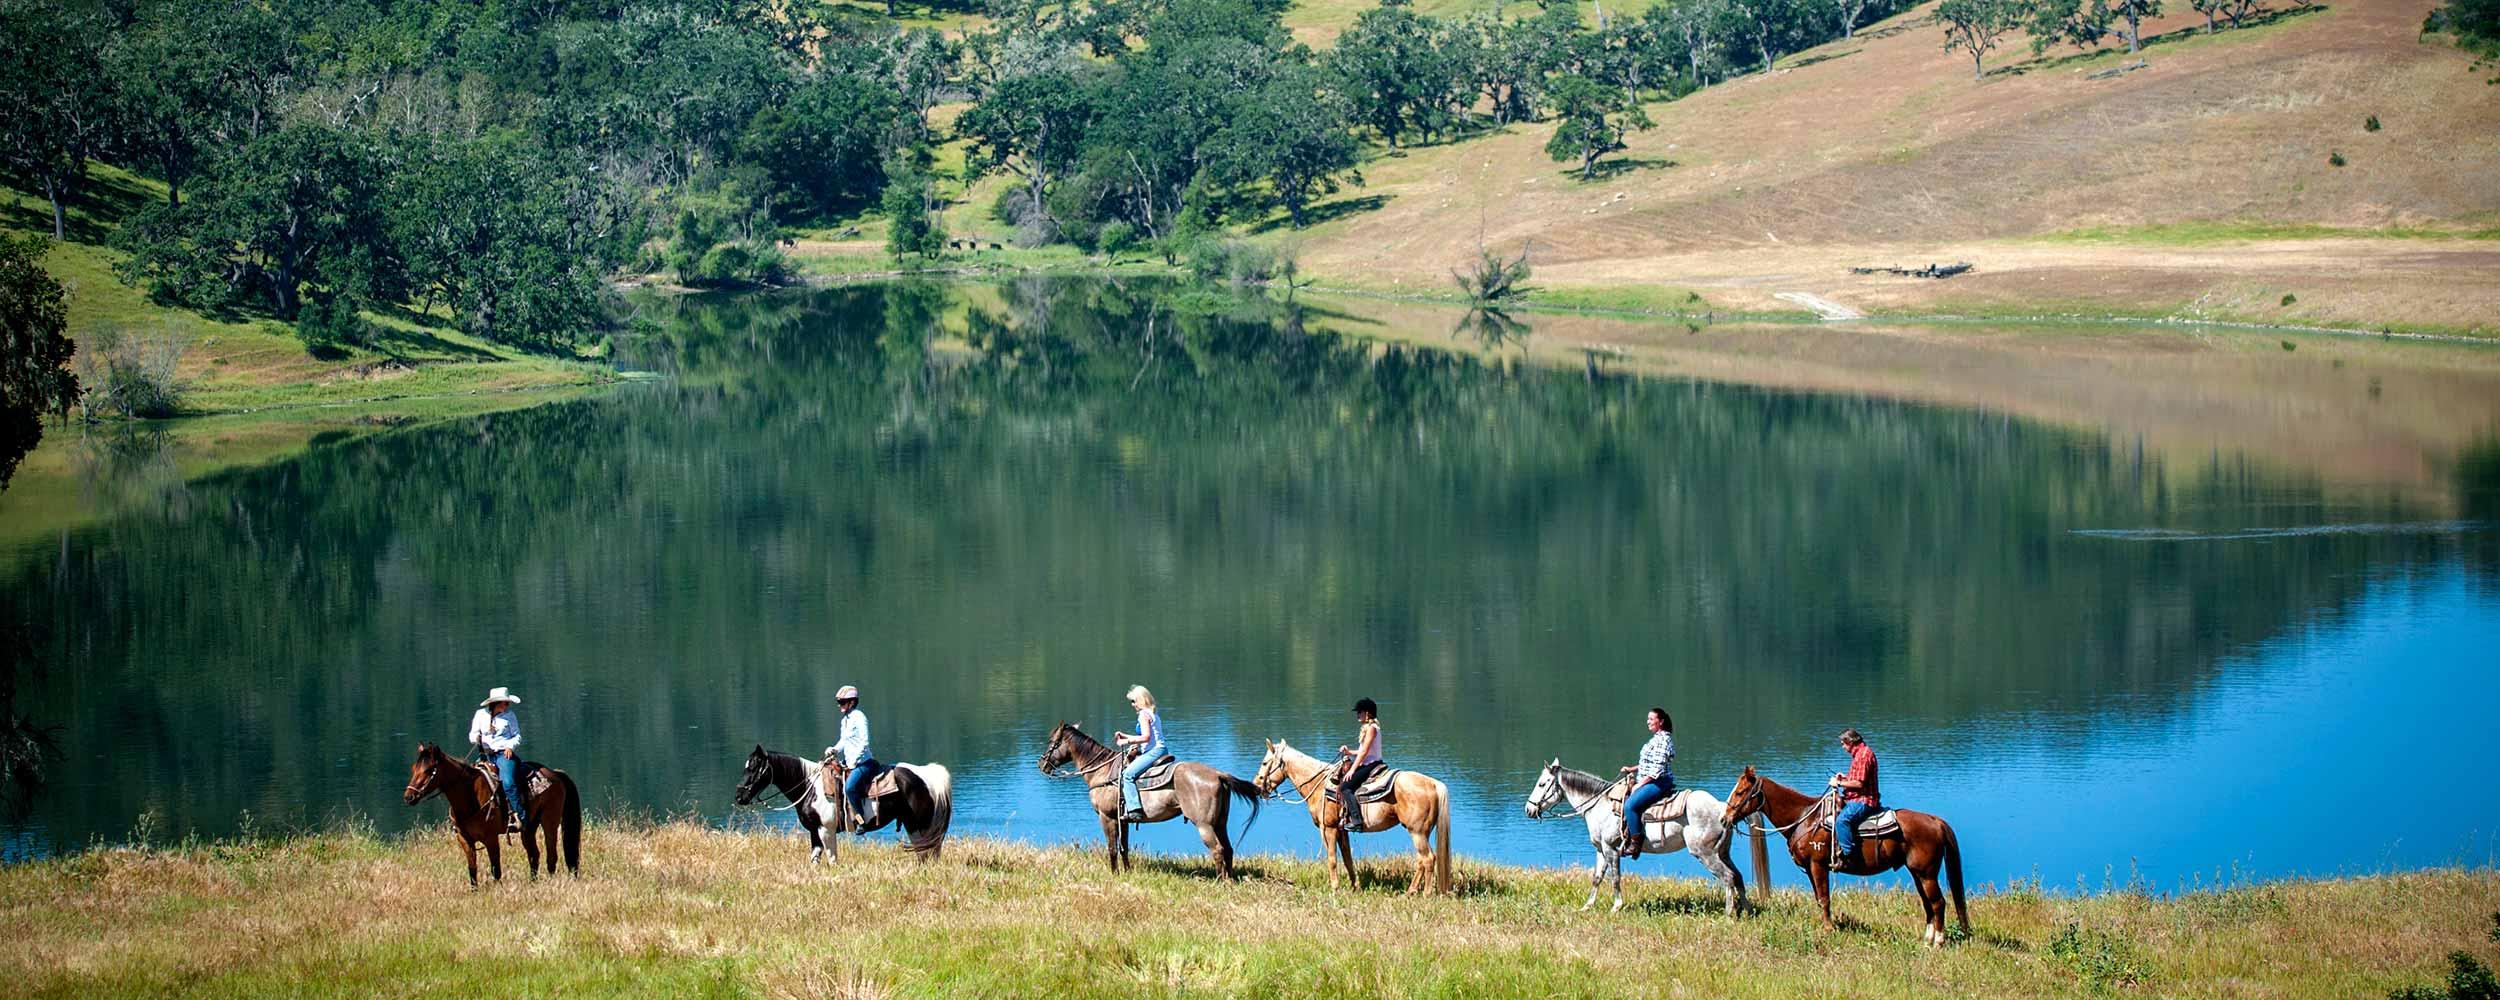 horseback riding by the Lake - Alisal Resort in Solvang California